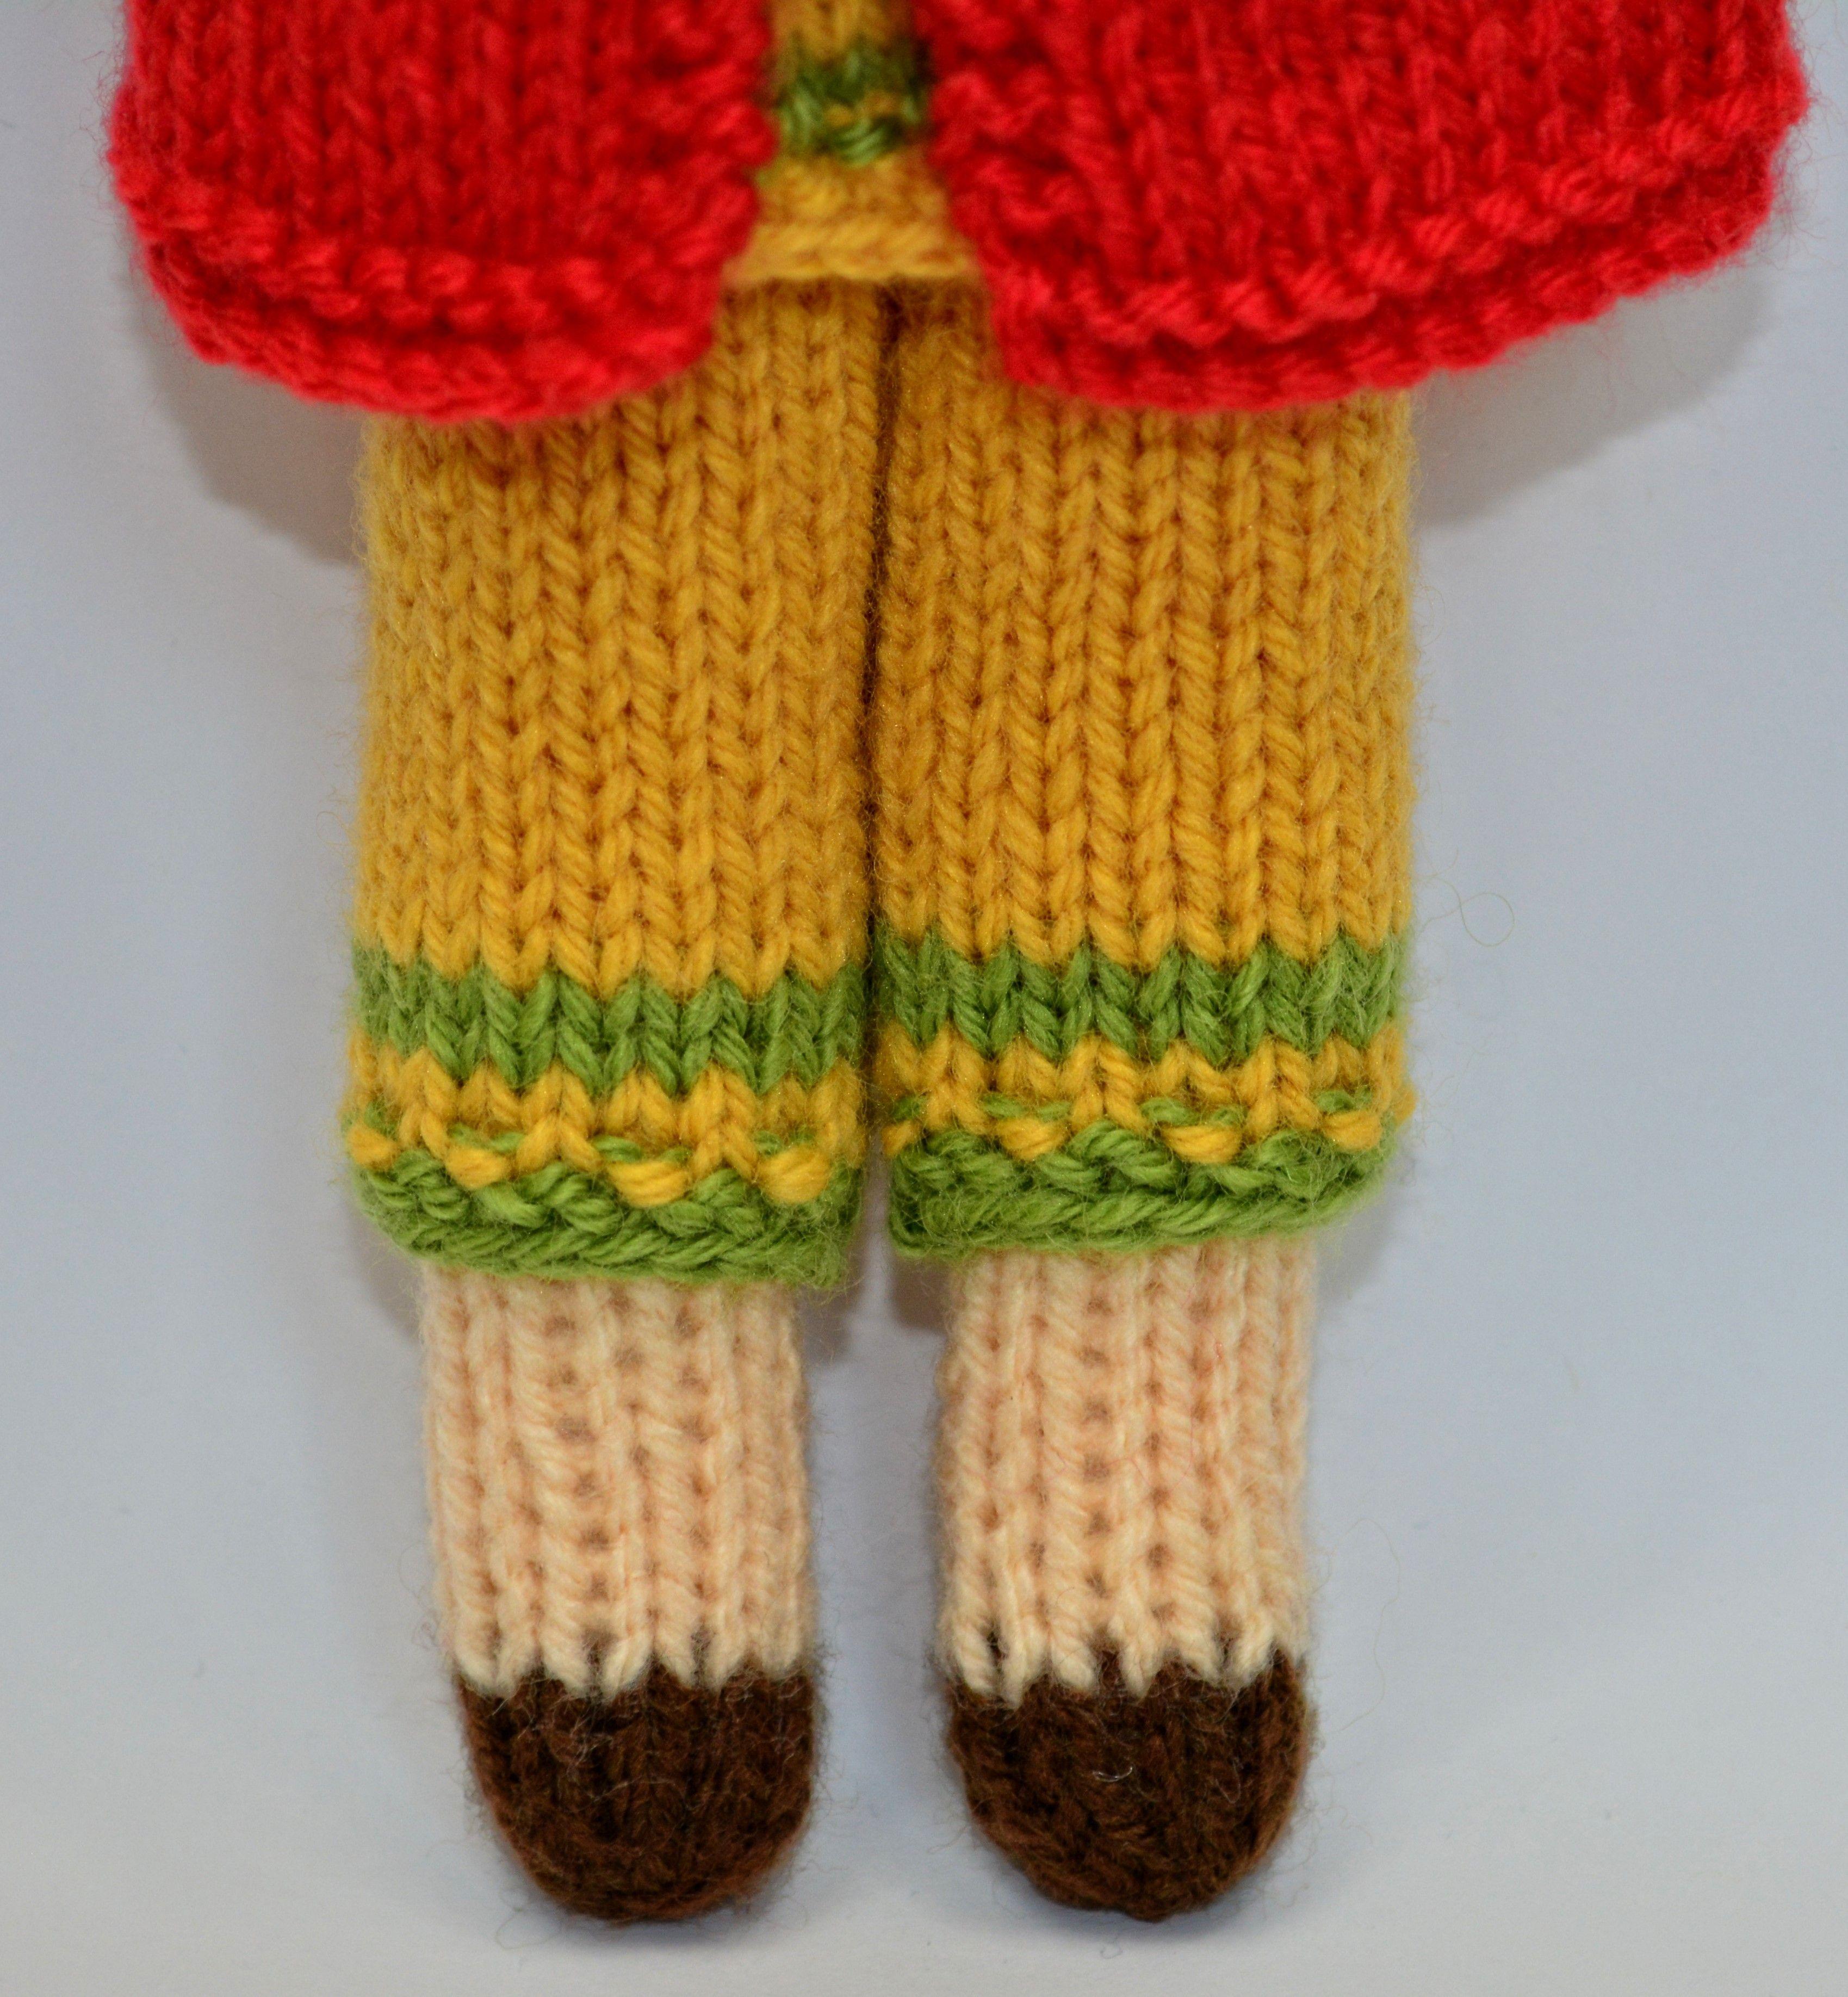 Daisy Rag Doll, Toy Doll Knitting Pattern   Knitting ...